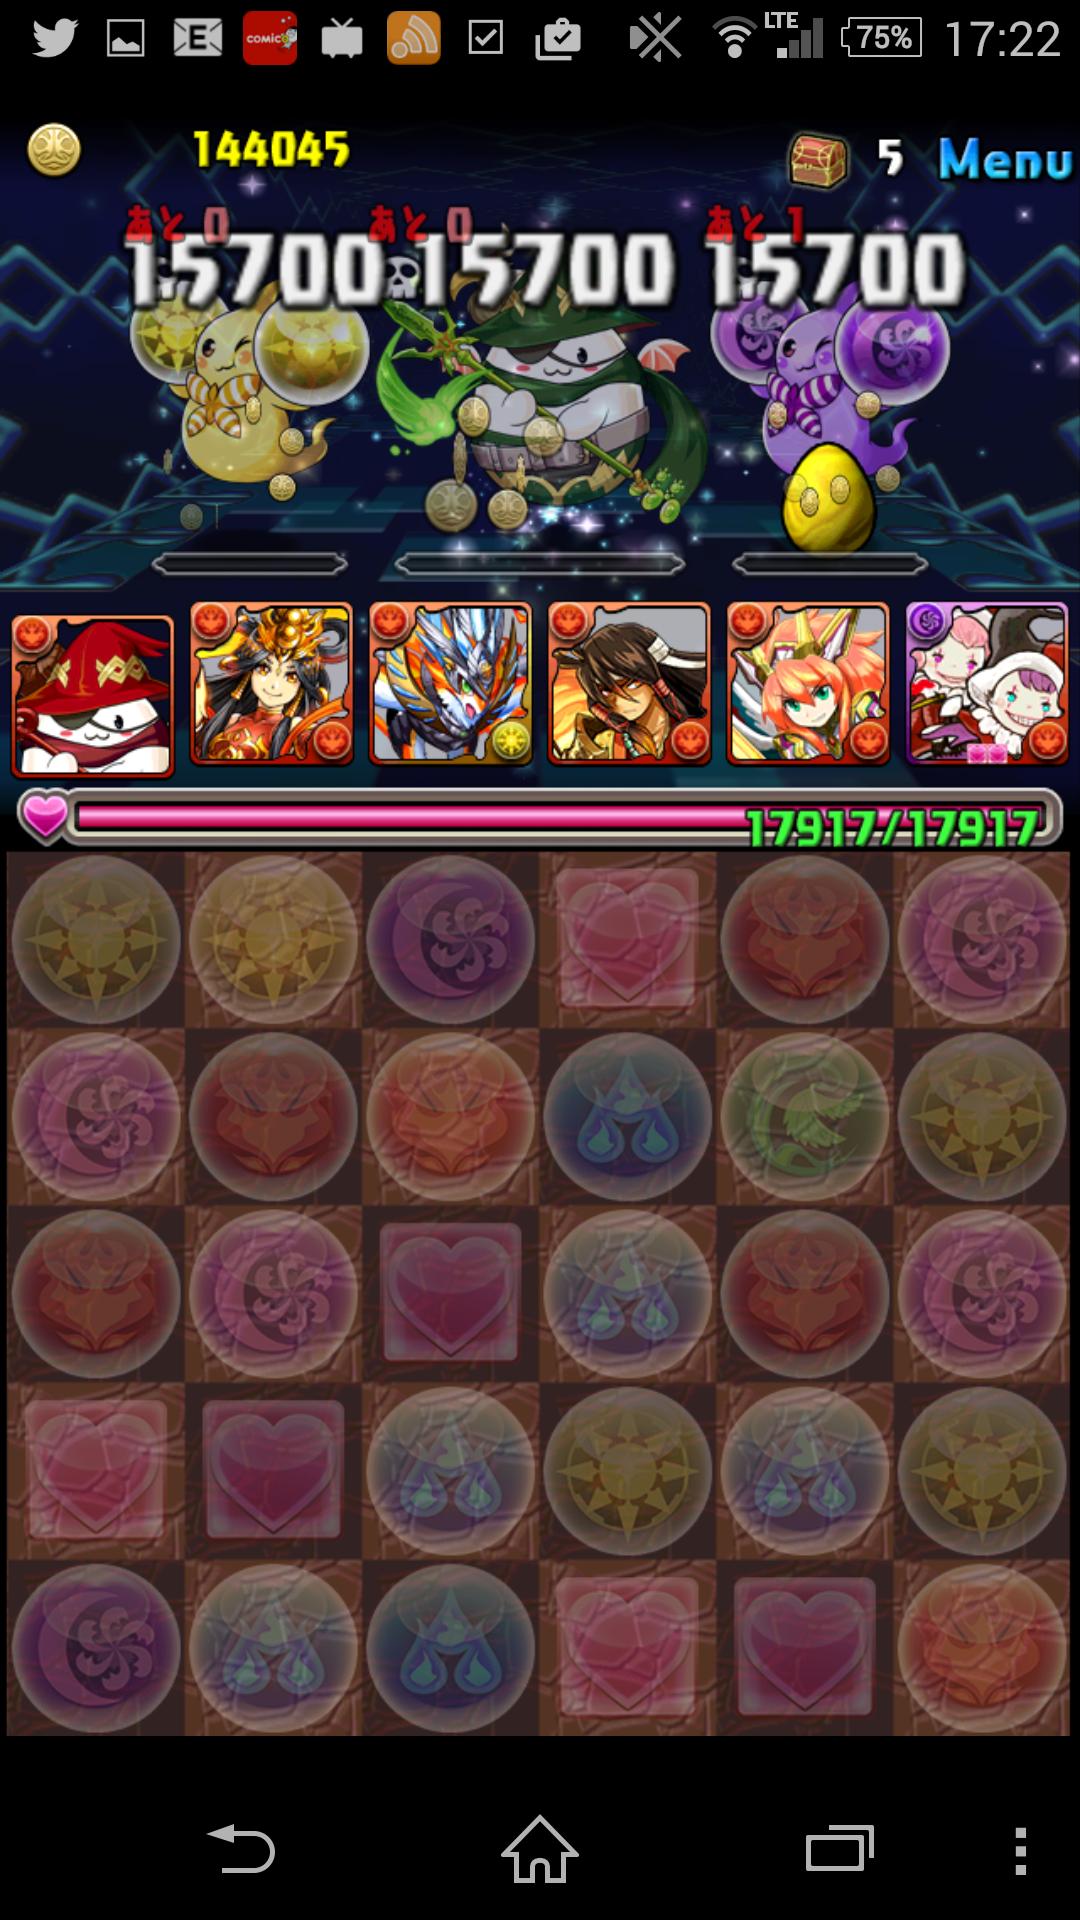 Screenshot_2015-03-21-17-22-13.png